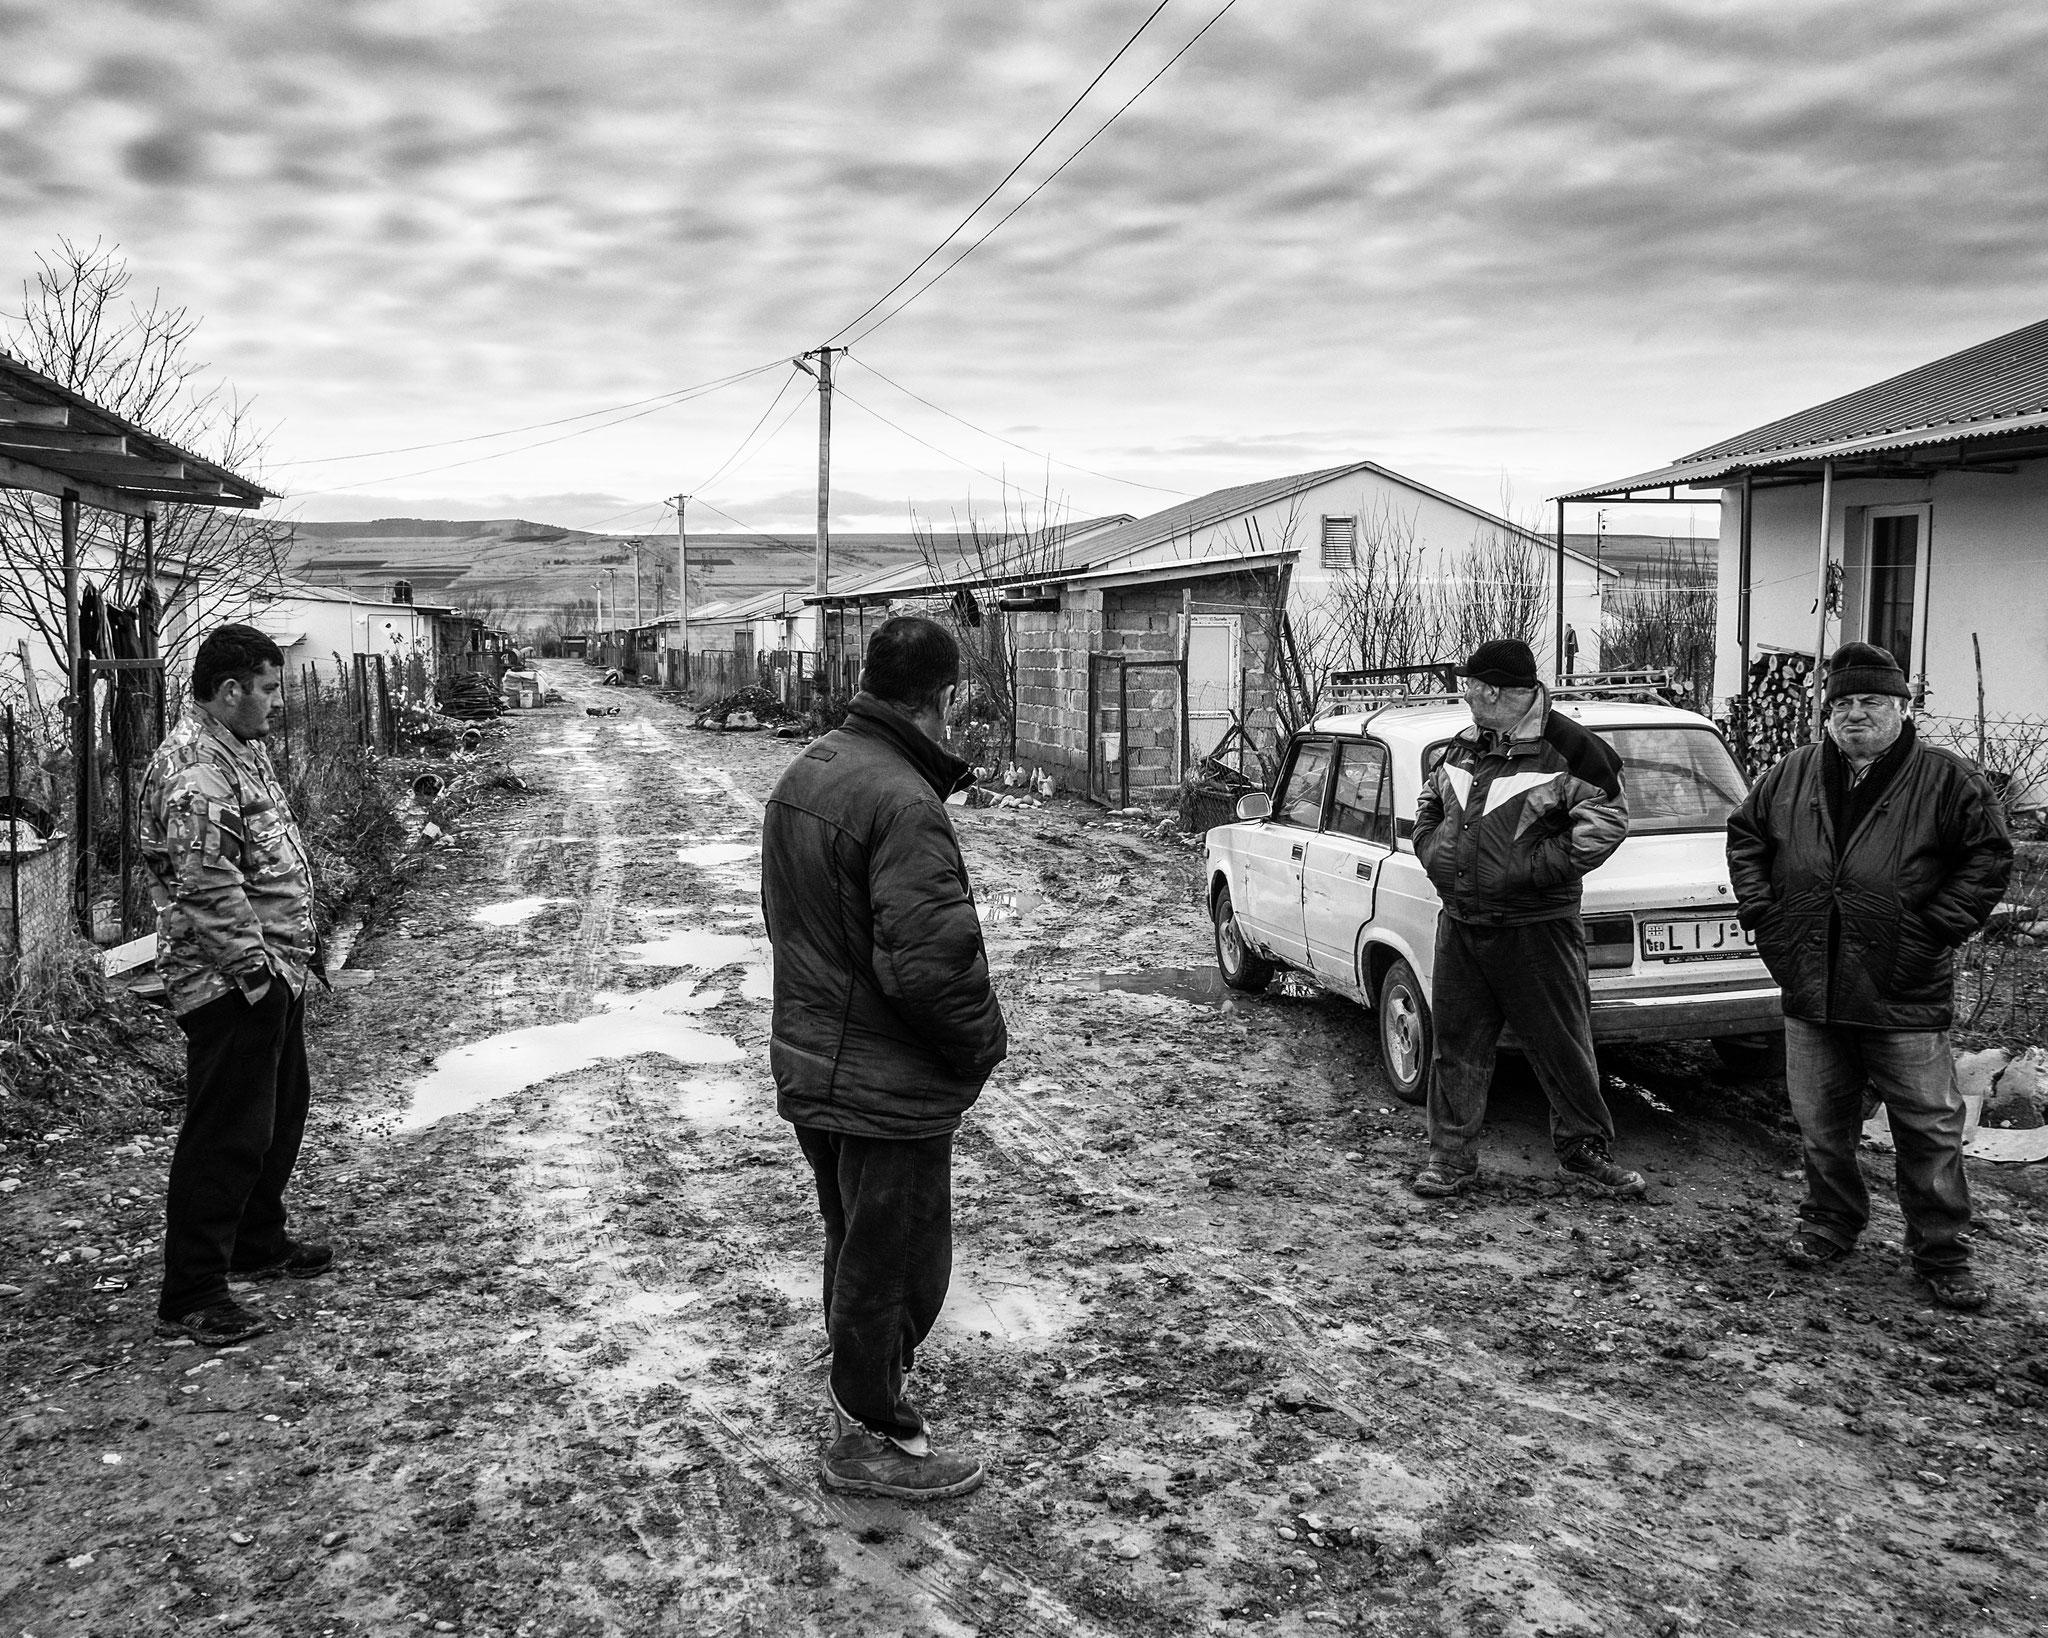 IDP from South Ossetia, Camp near the Border, Georgia